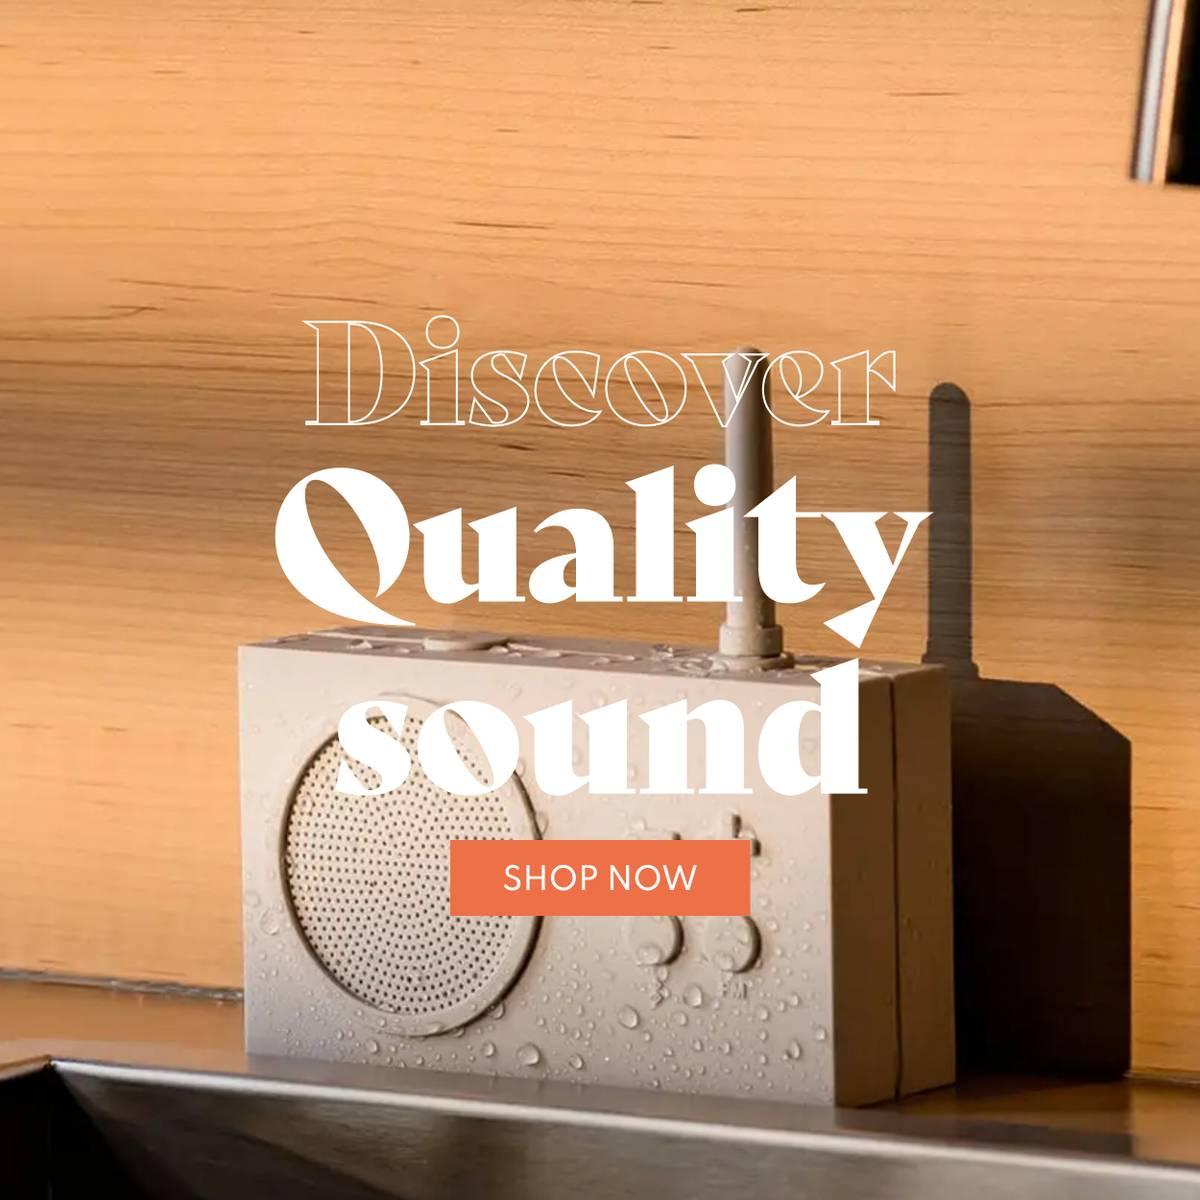 Quality sound - Audio